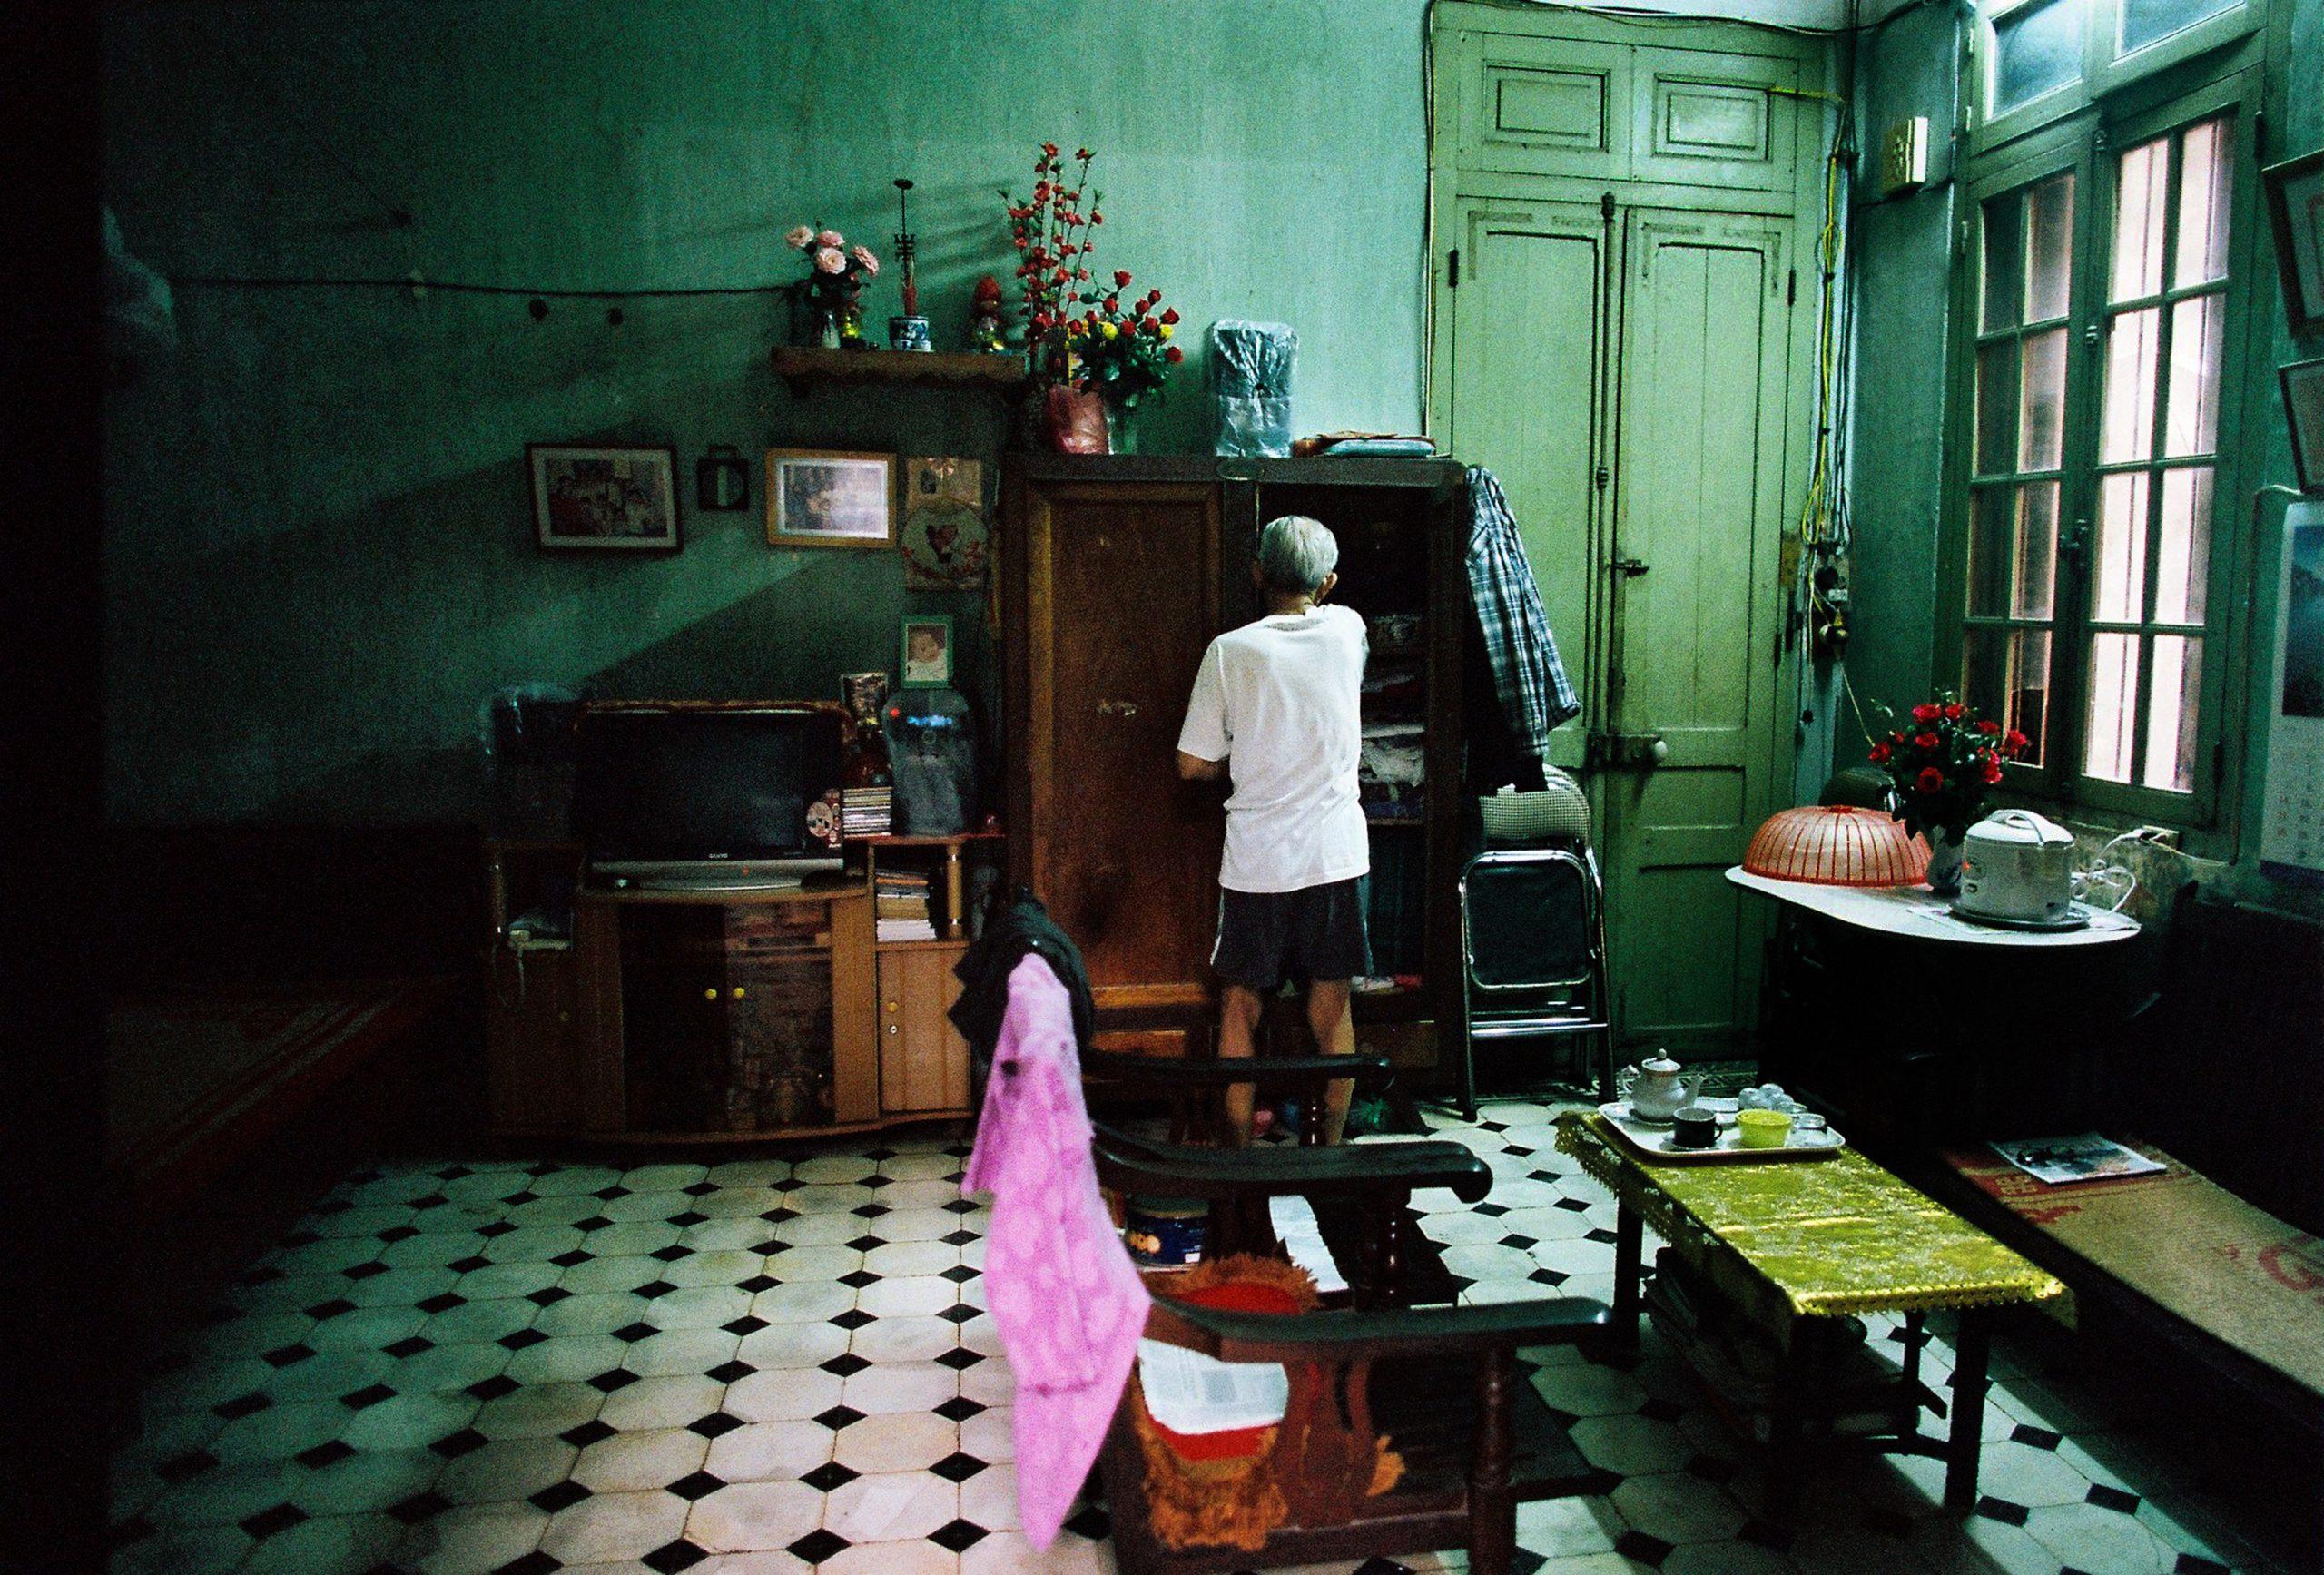 Color photo by Maika Elan from Inside Hanoi